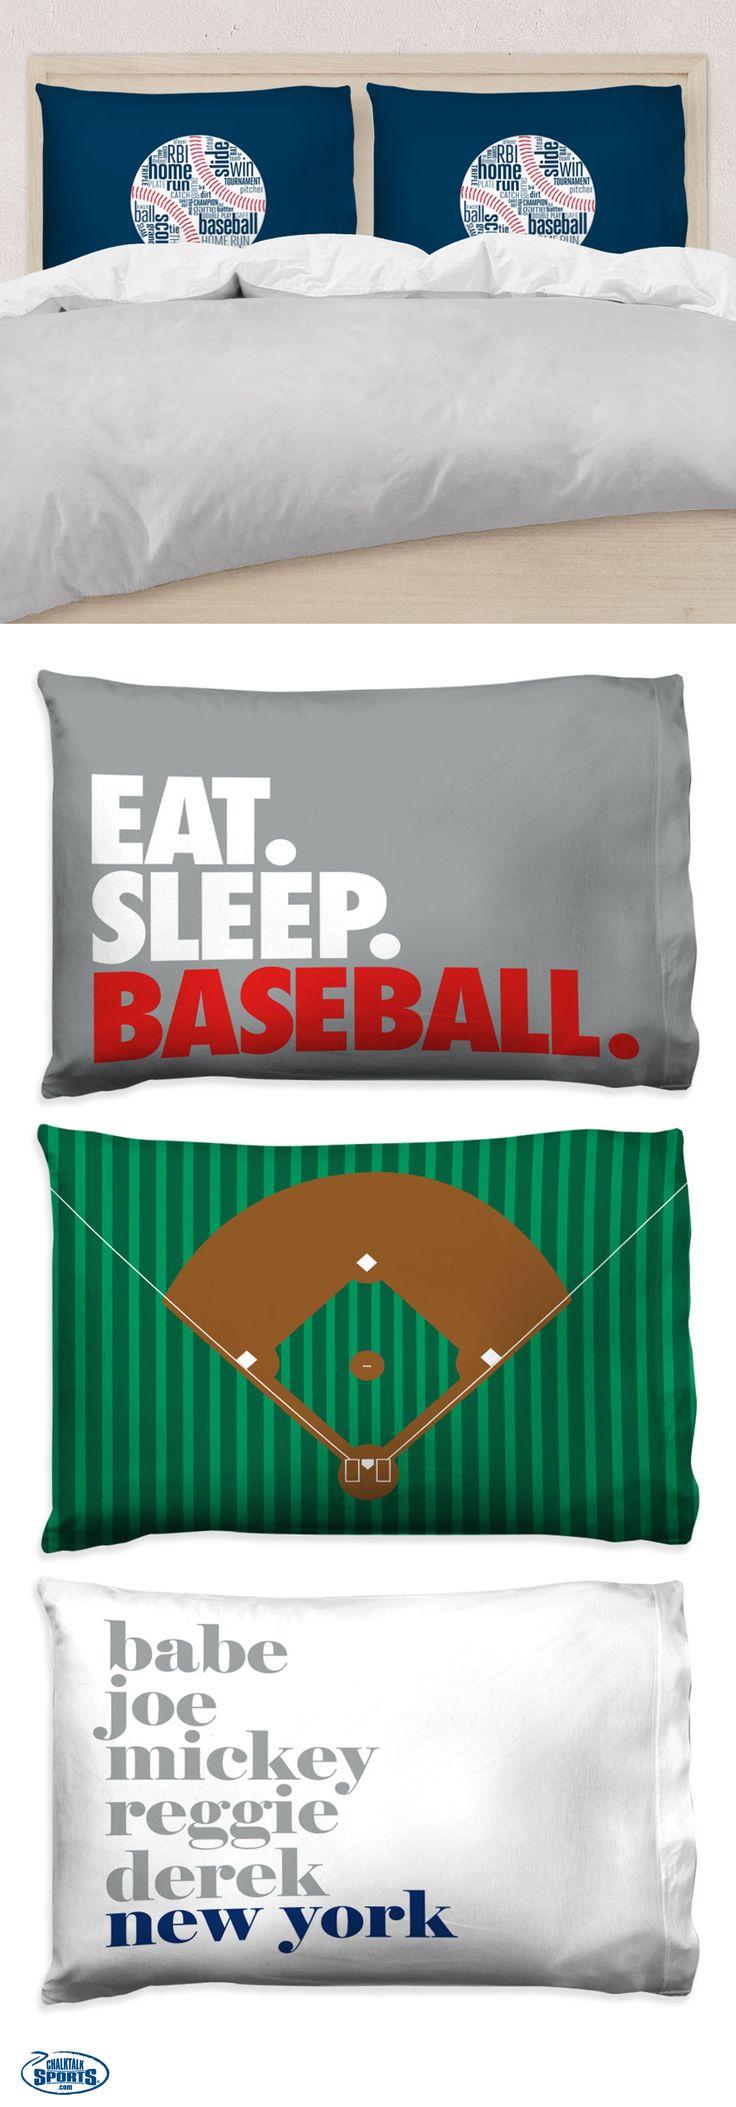 25+ best ideas about Baseball room decor on Pinterest | Sports ...